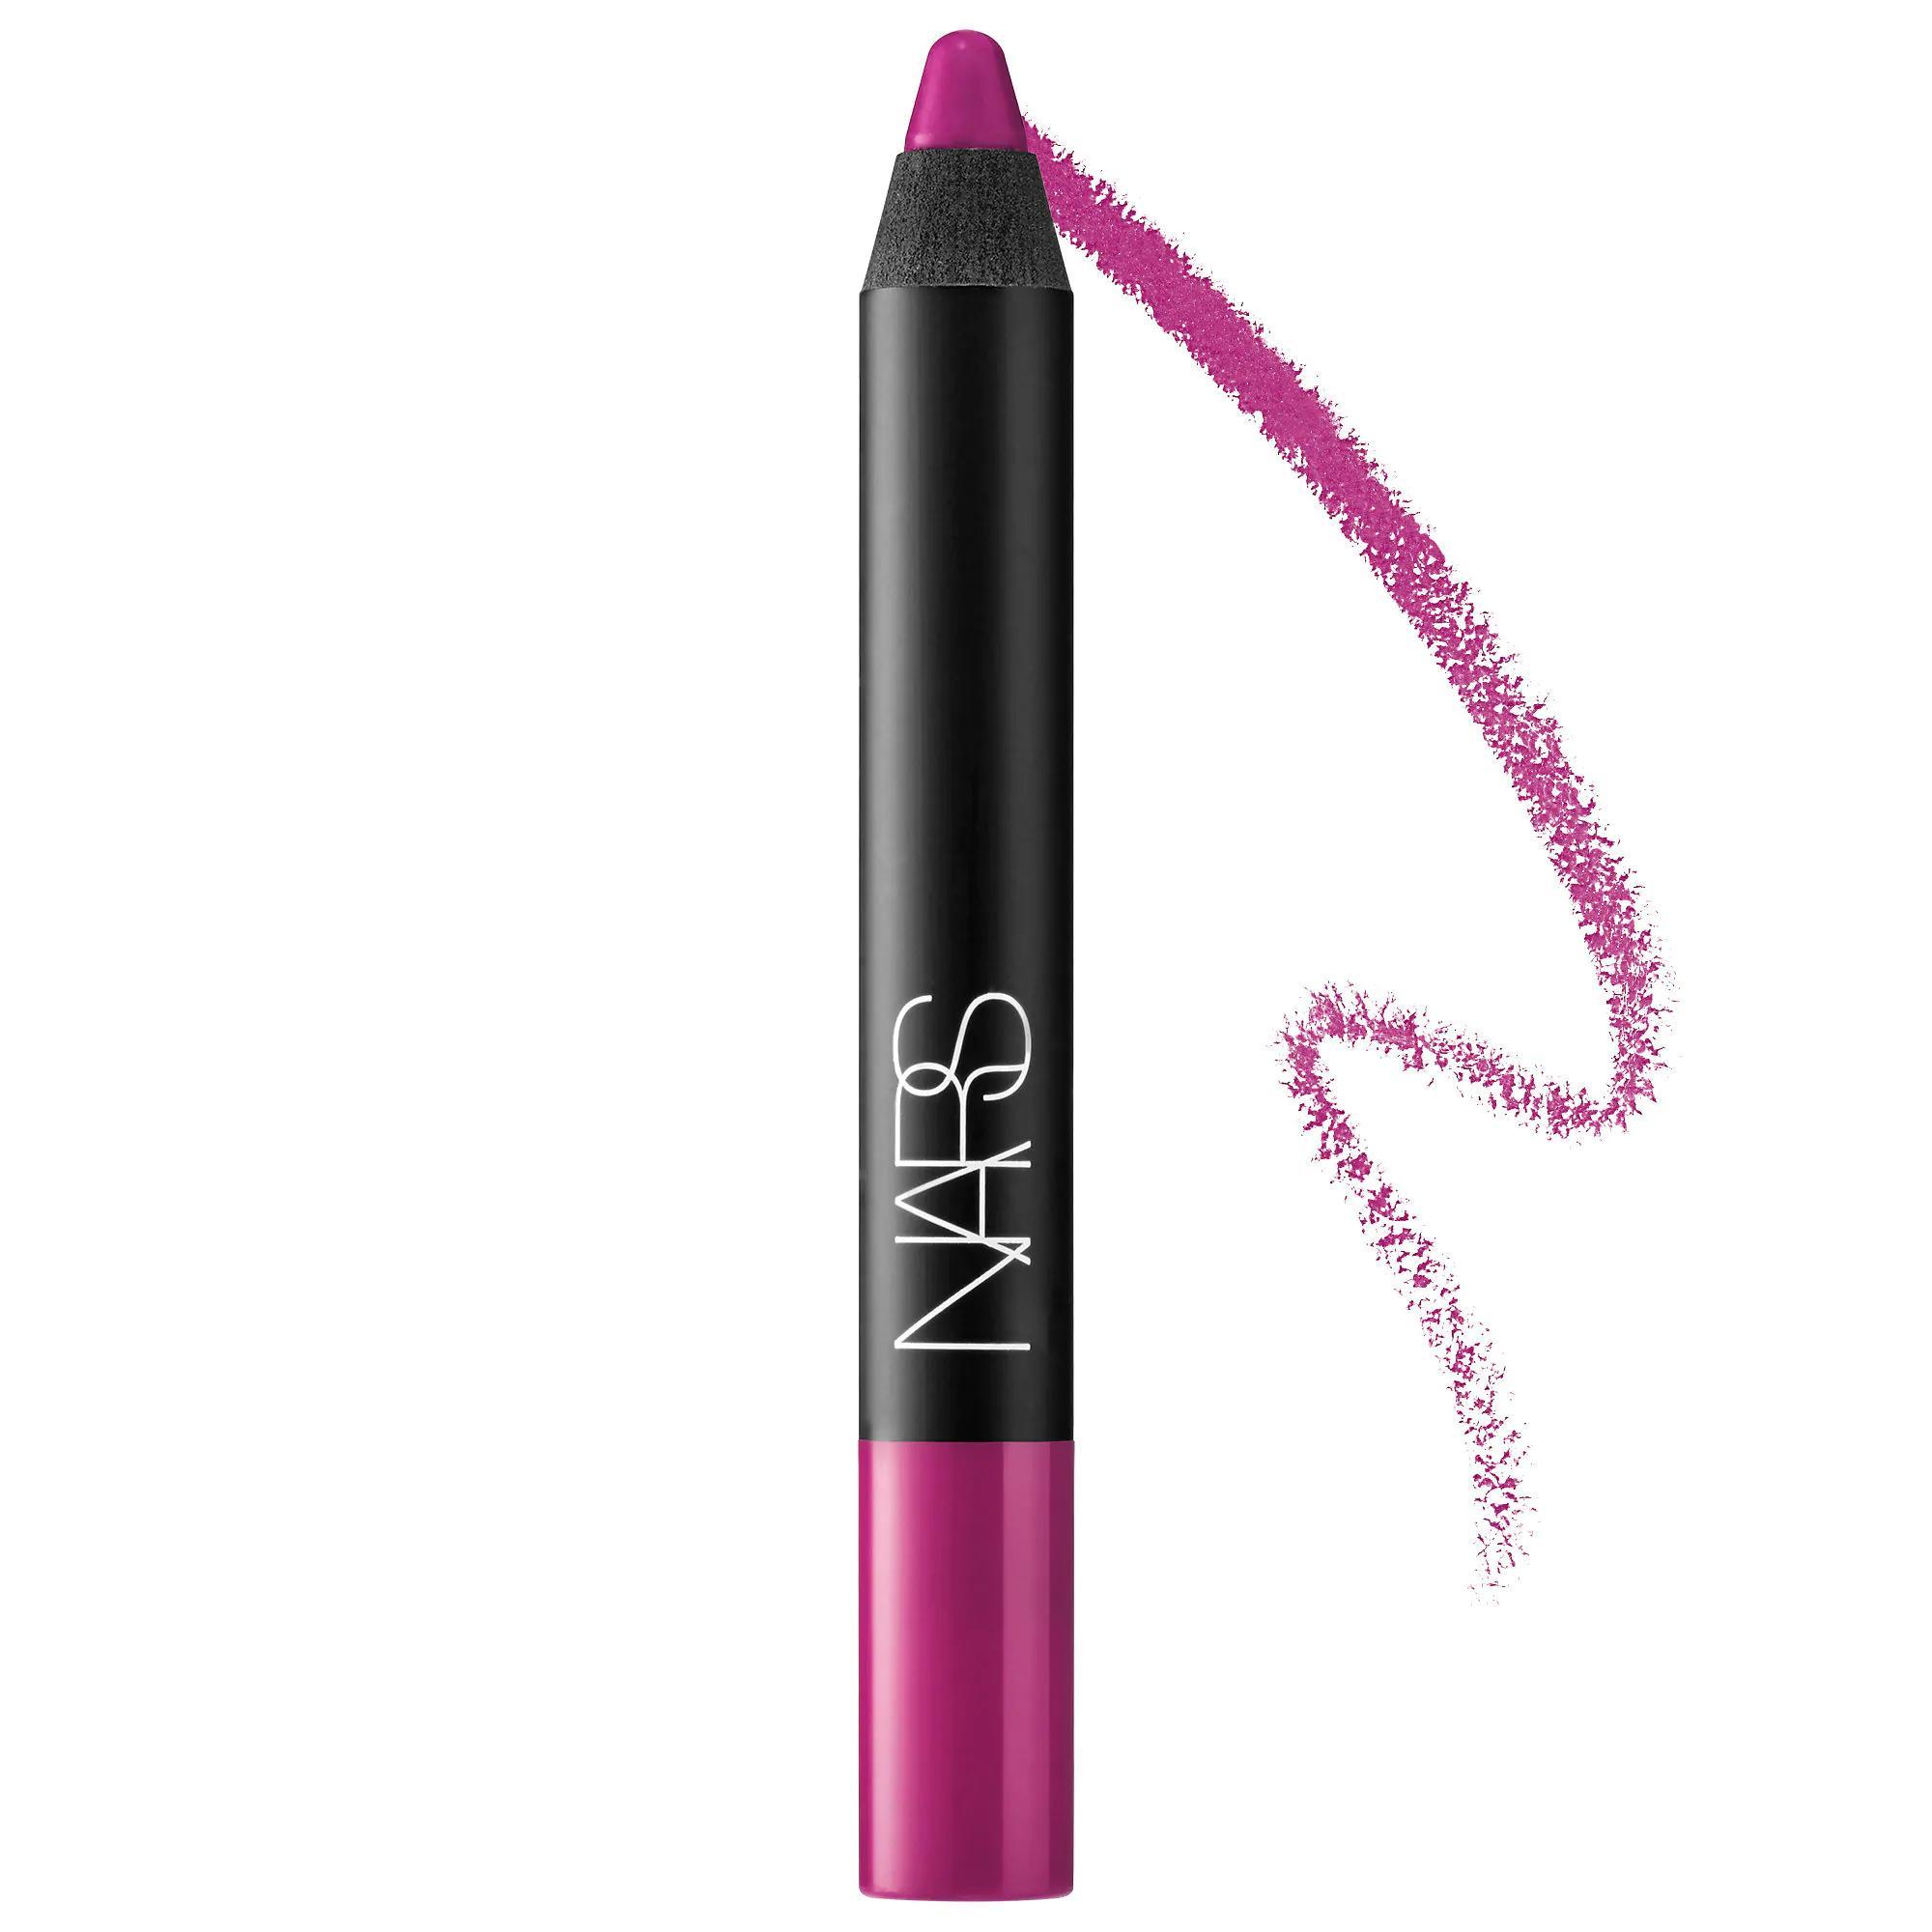 NARS Velvet Matte Lip Pencil Promiscuous